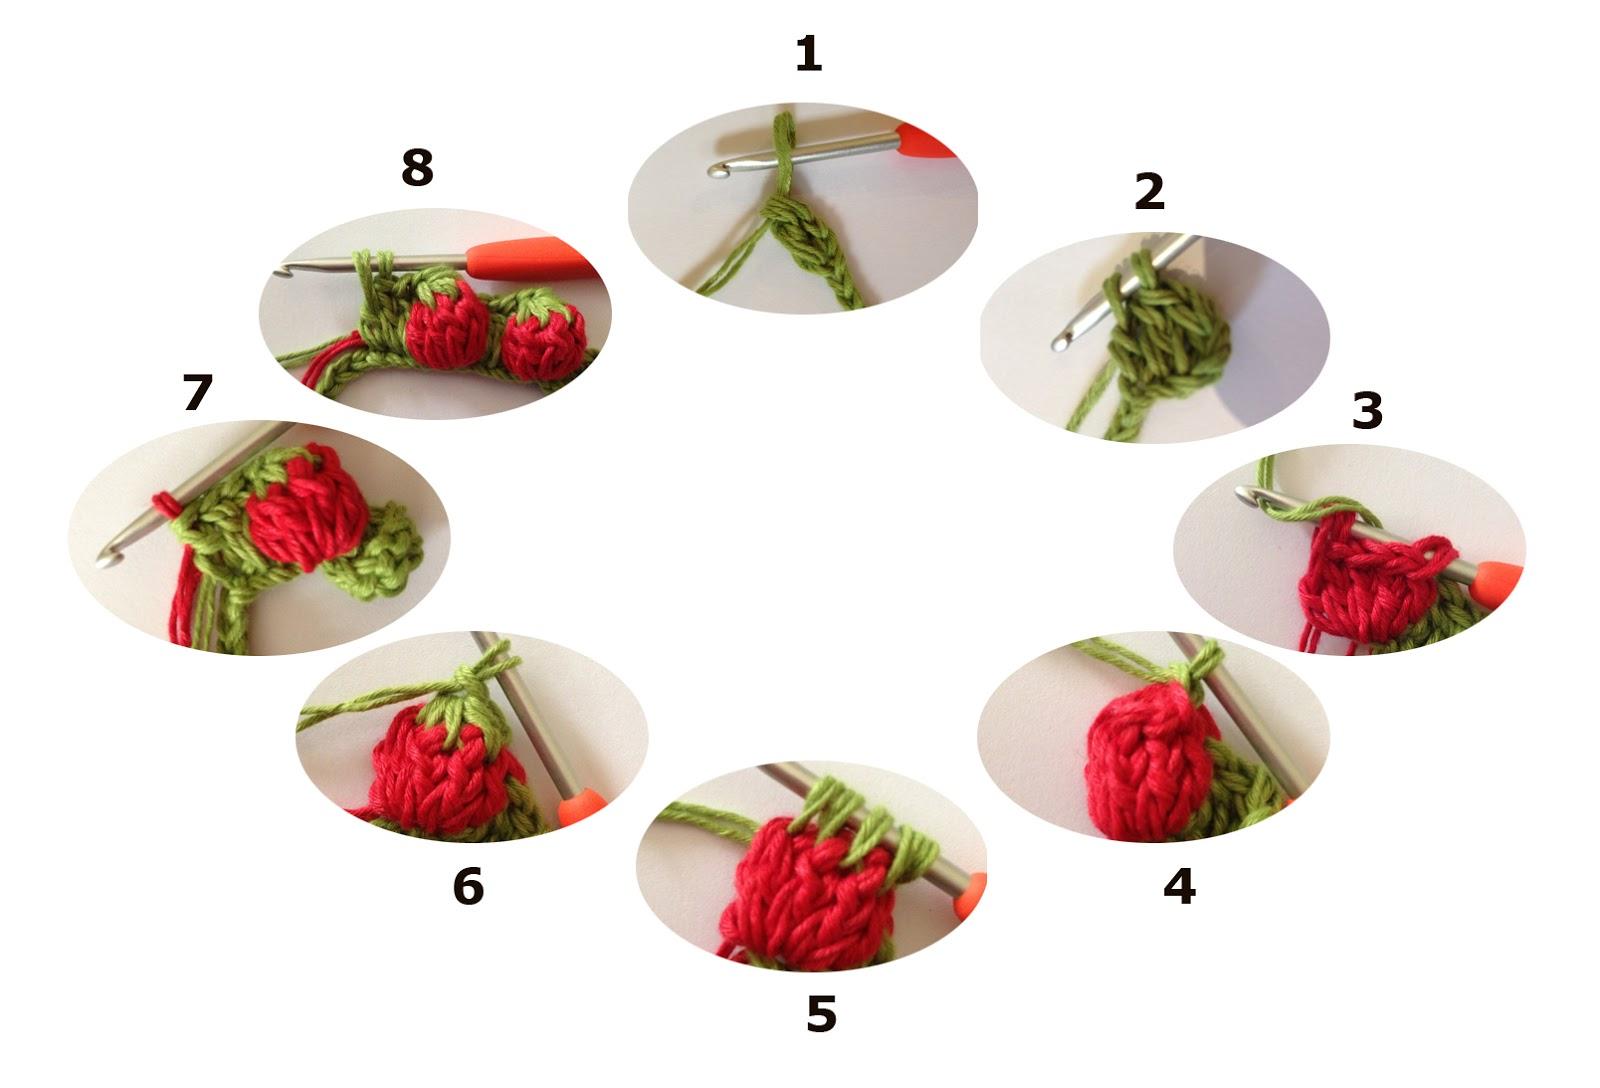 http://4.bp.blogspot.com/-KZEgpgP3W7A/UgTIPcJN0MI/AAAAAAAAAG8/d6YhWge3uXE/s1600/step+by+step+strawberry+crochet.jpg